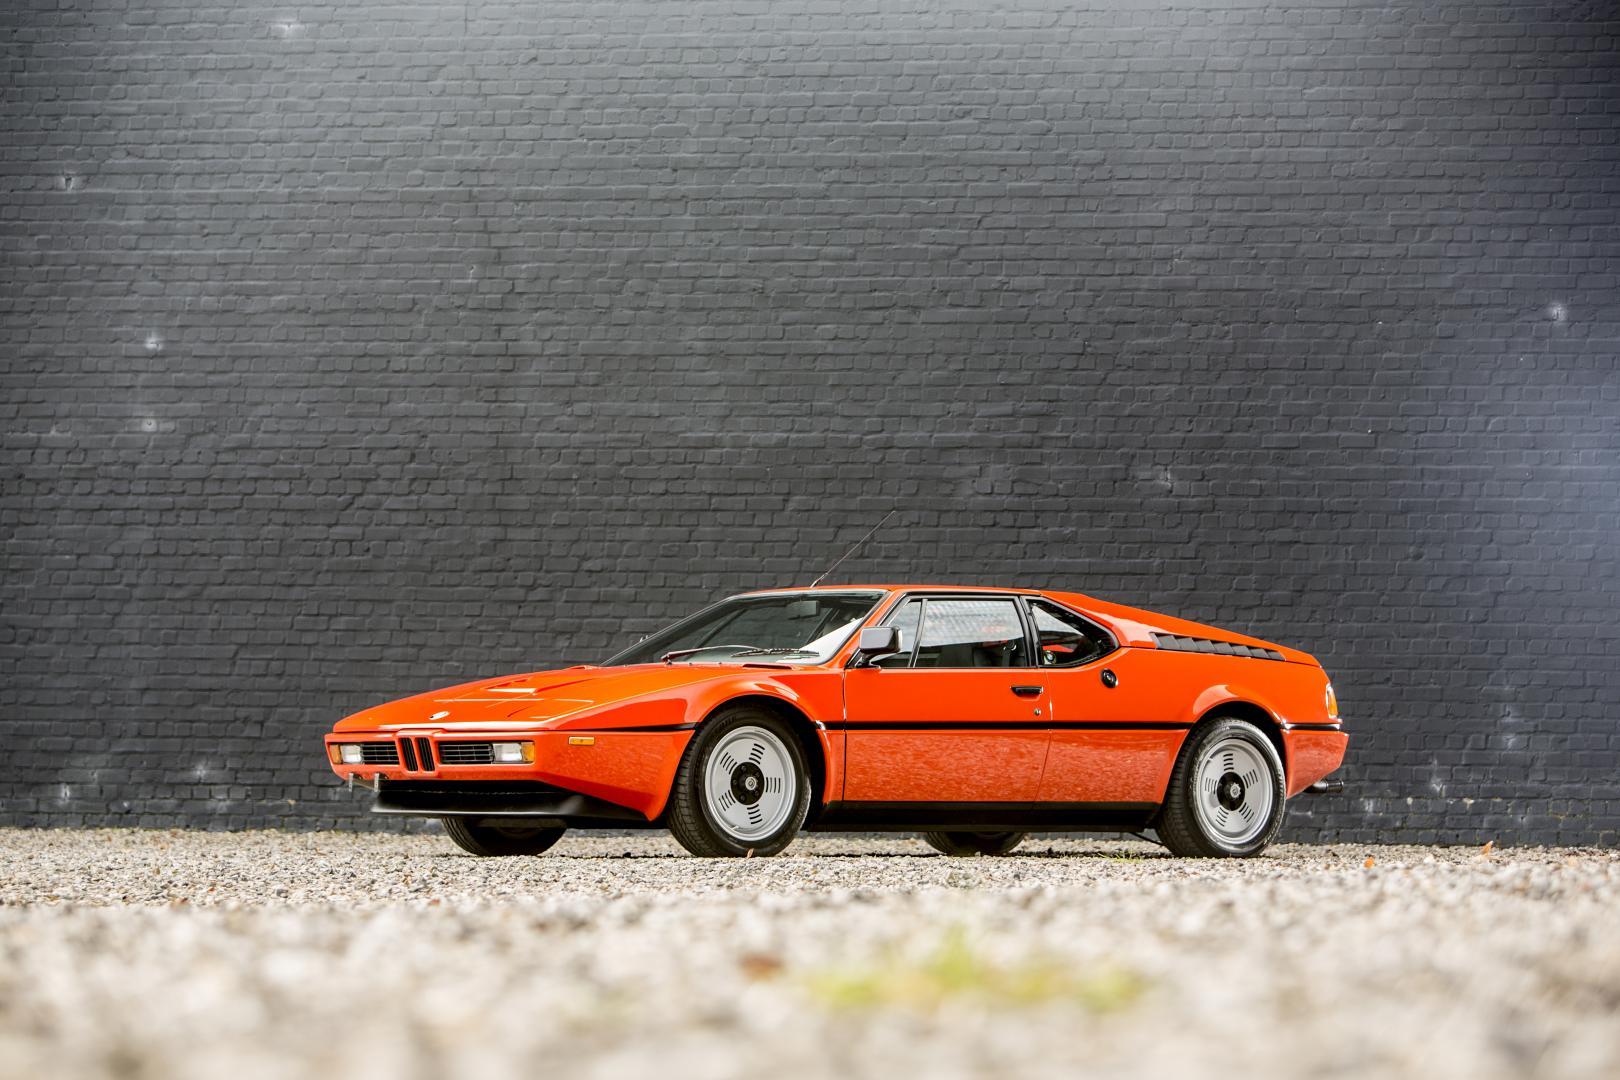 Veiling BMW M1 (1980)